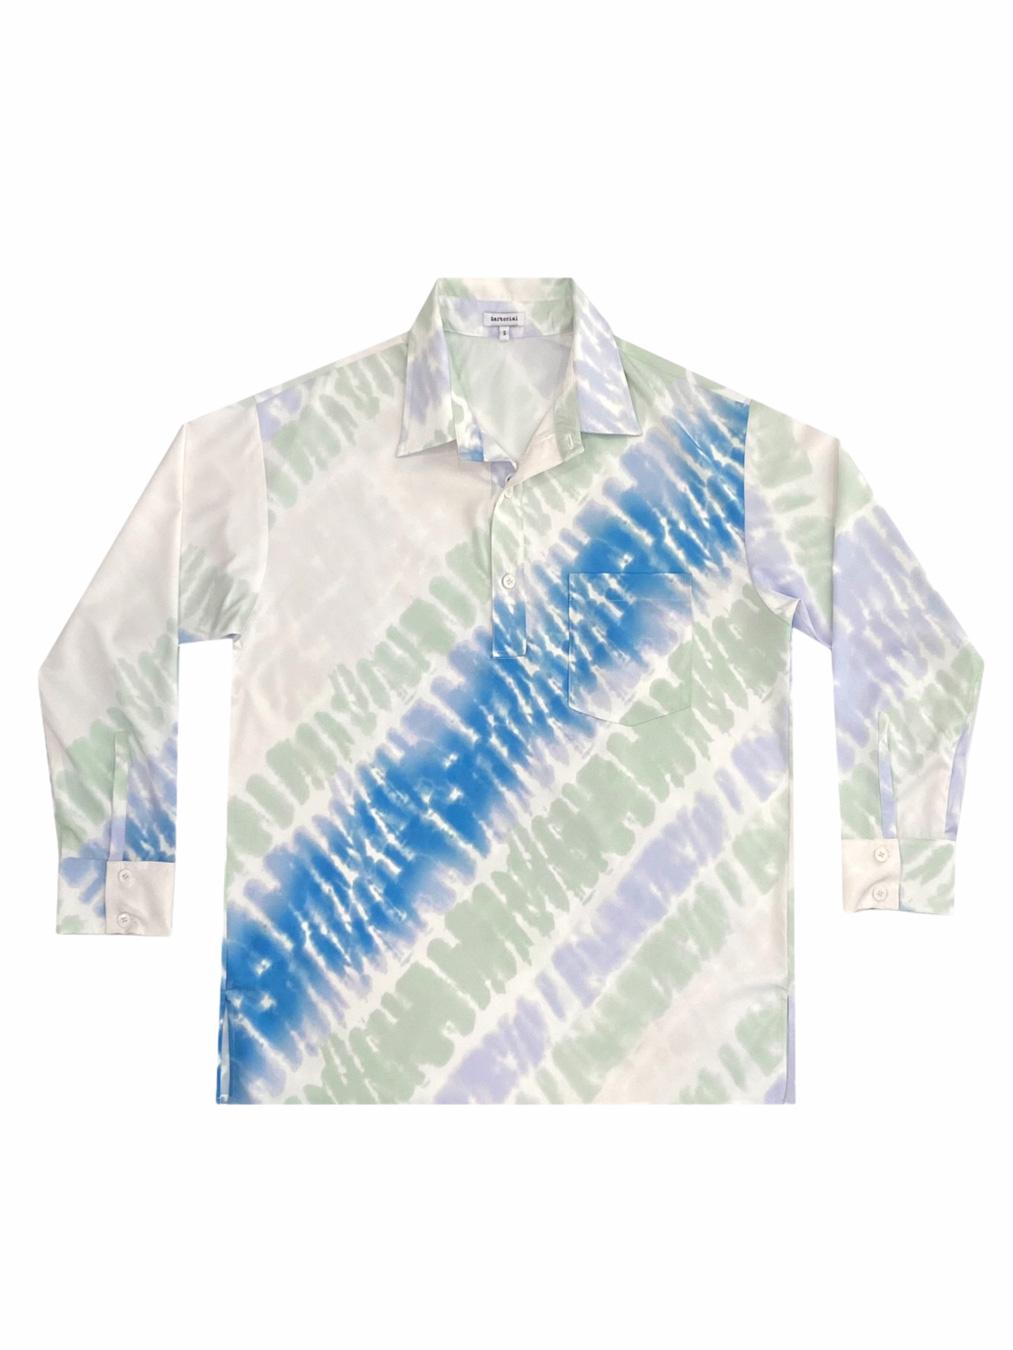 Pyjamas Tie - Dye Oversized Shirt (ฺBlue)